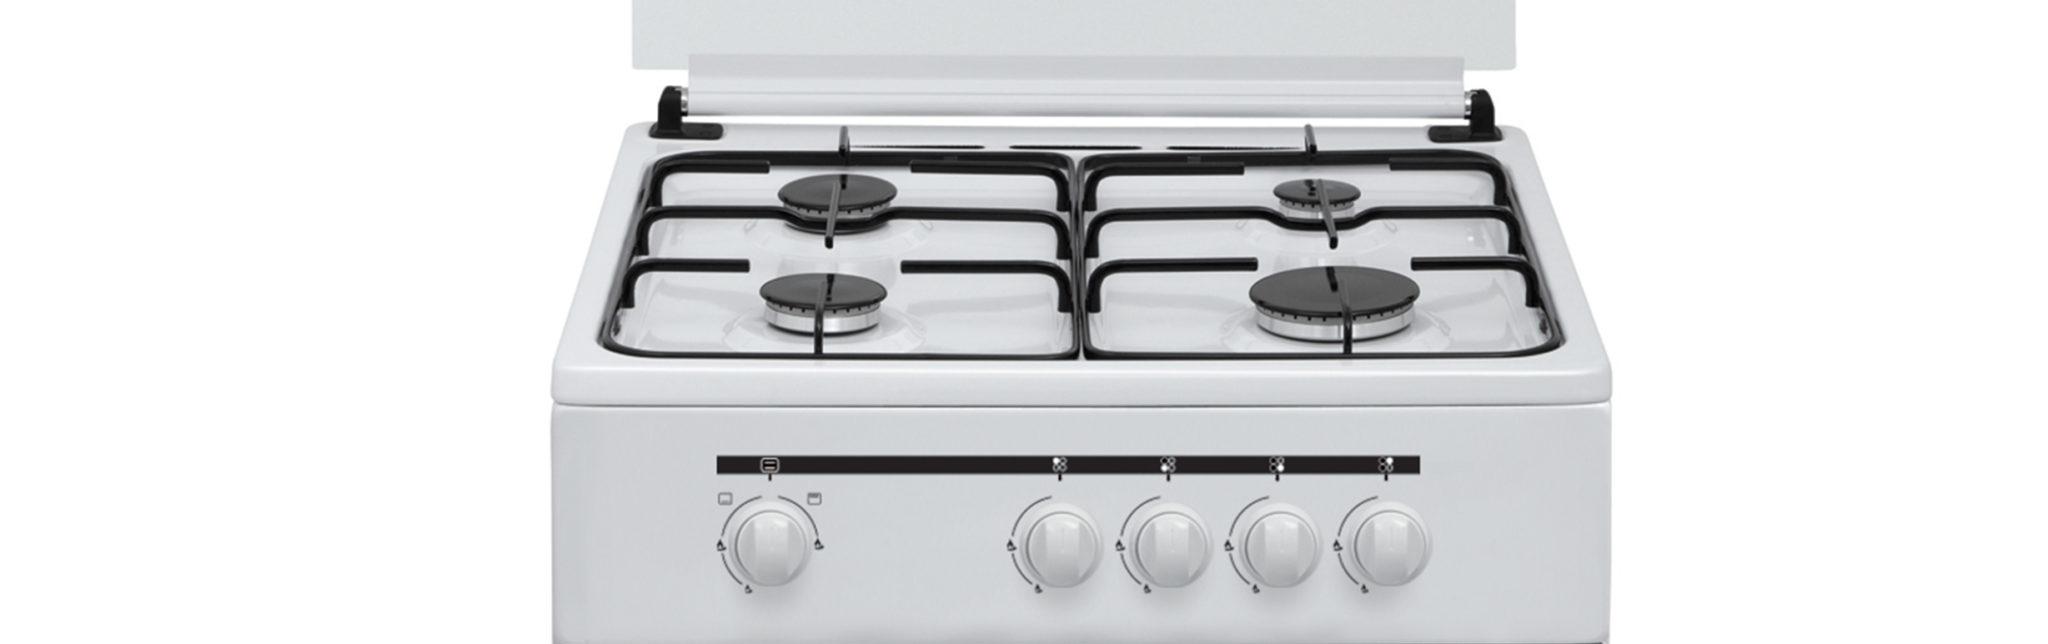 cocina a gas fogones